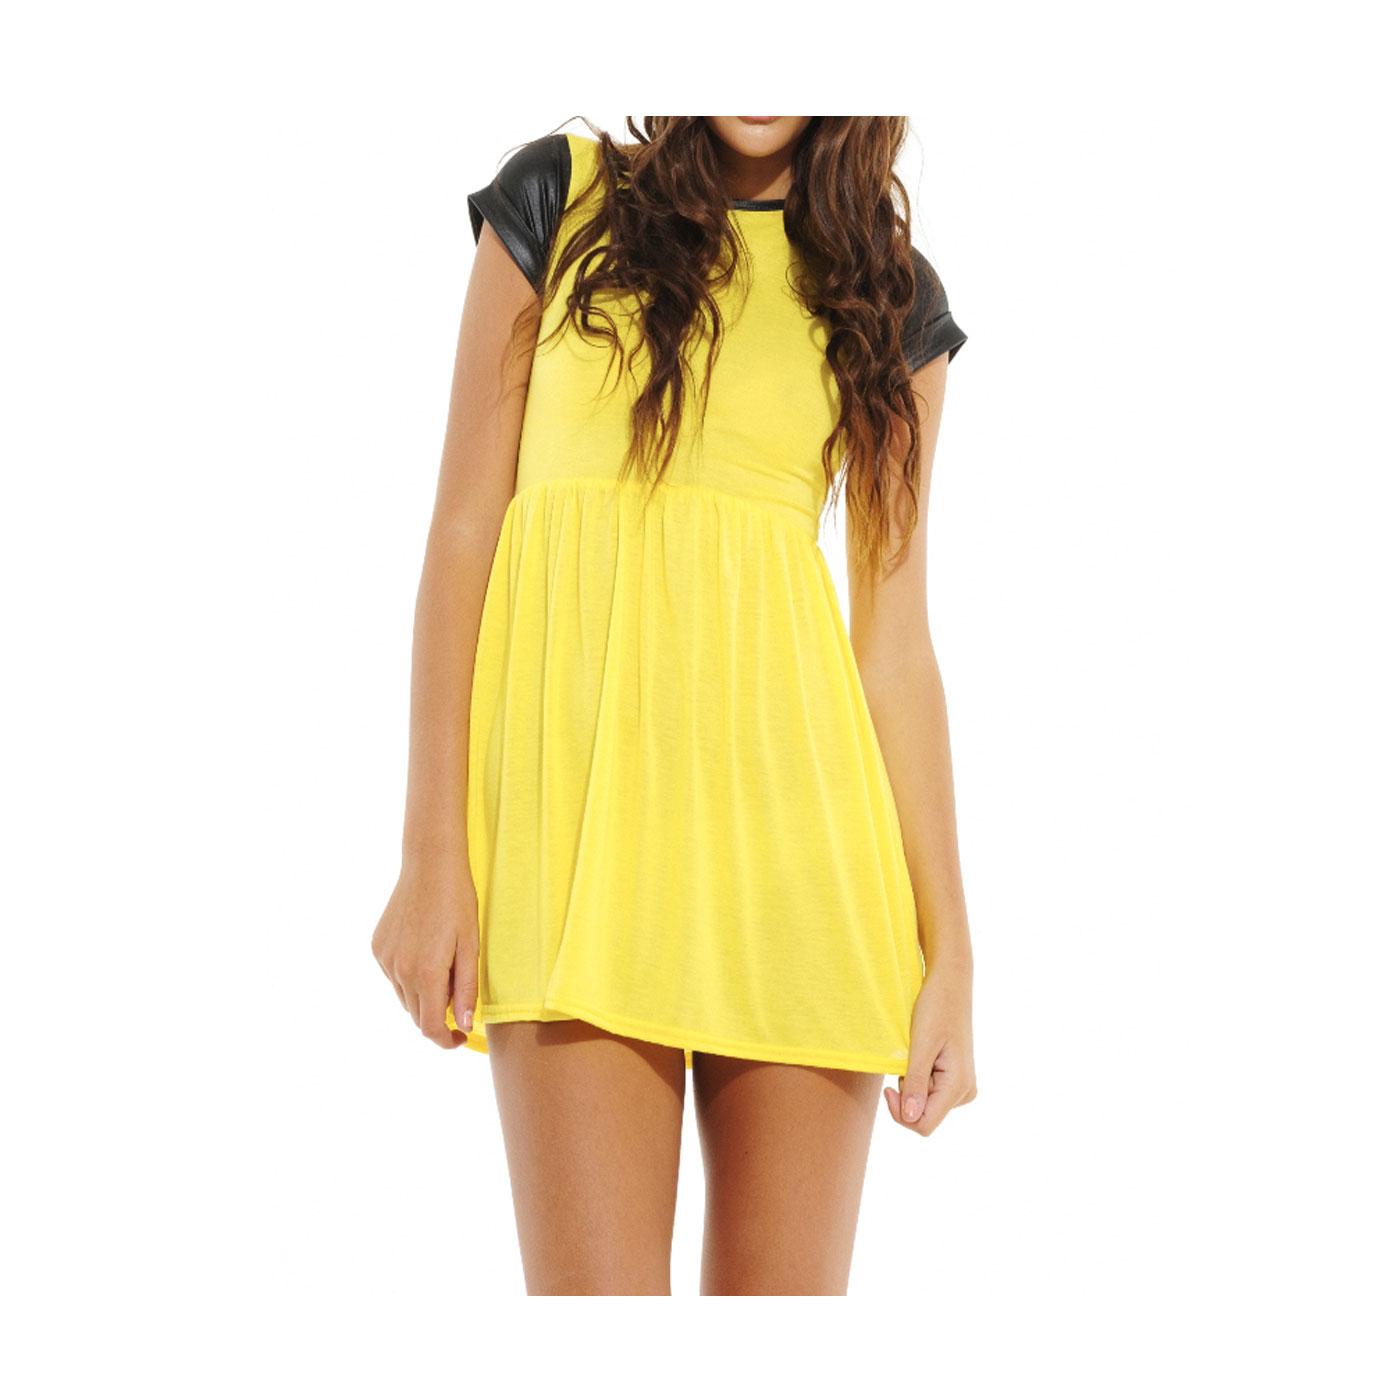 Innovative 31 Elegant Looking Under Womens Skirts U2013 Playzoa.com